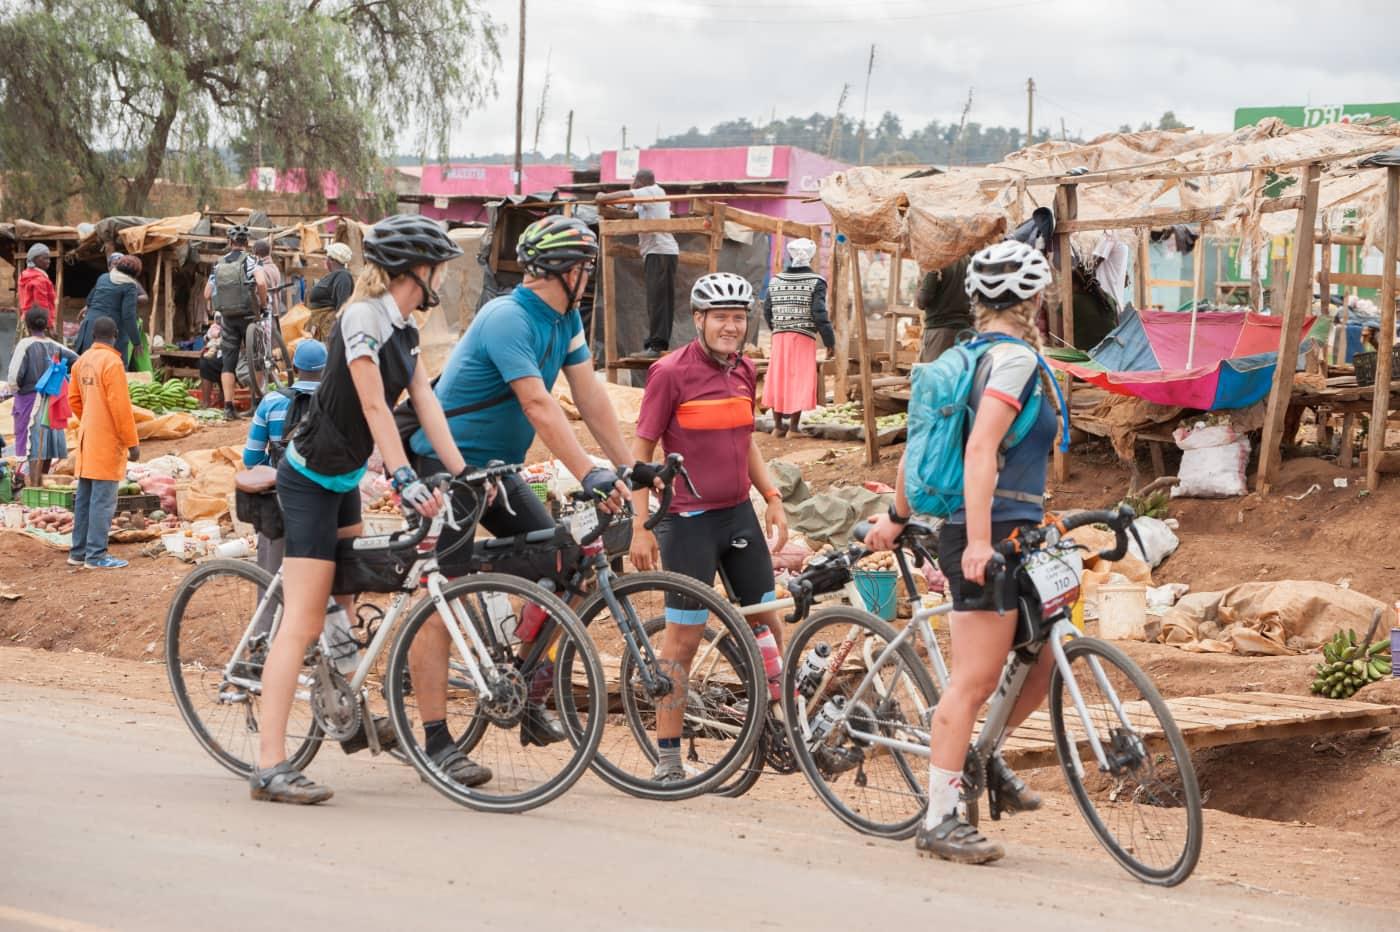 Tour d'Afrique | The original cross-continent Africa bike